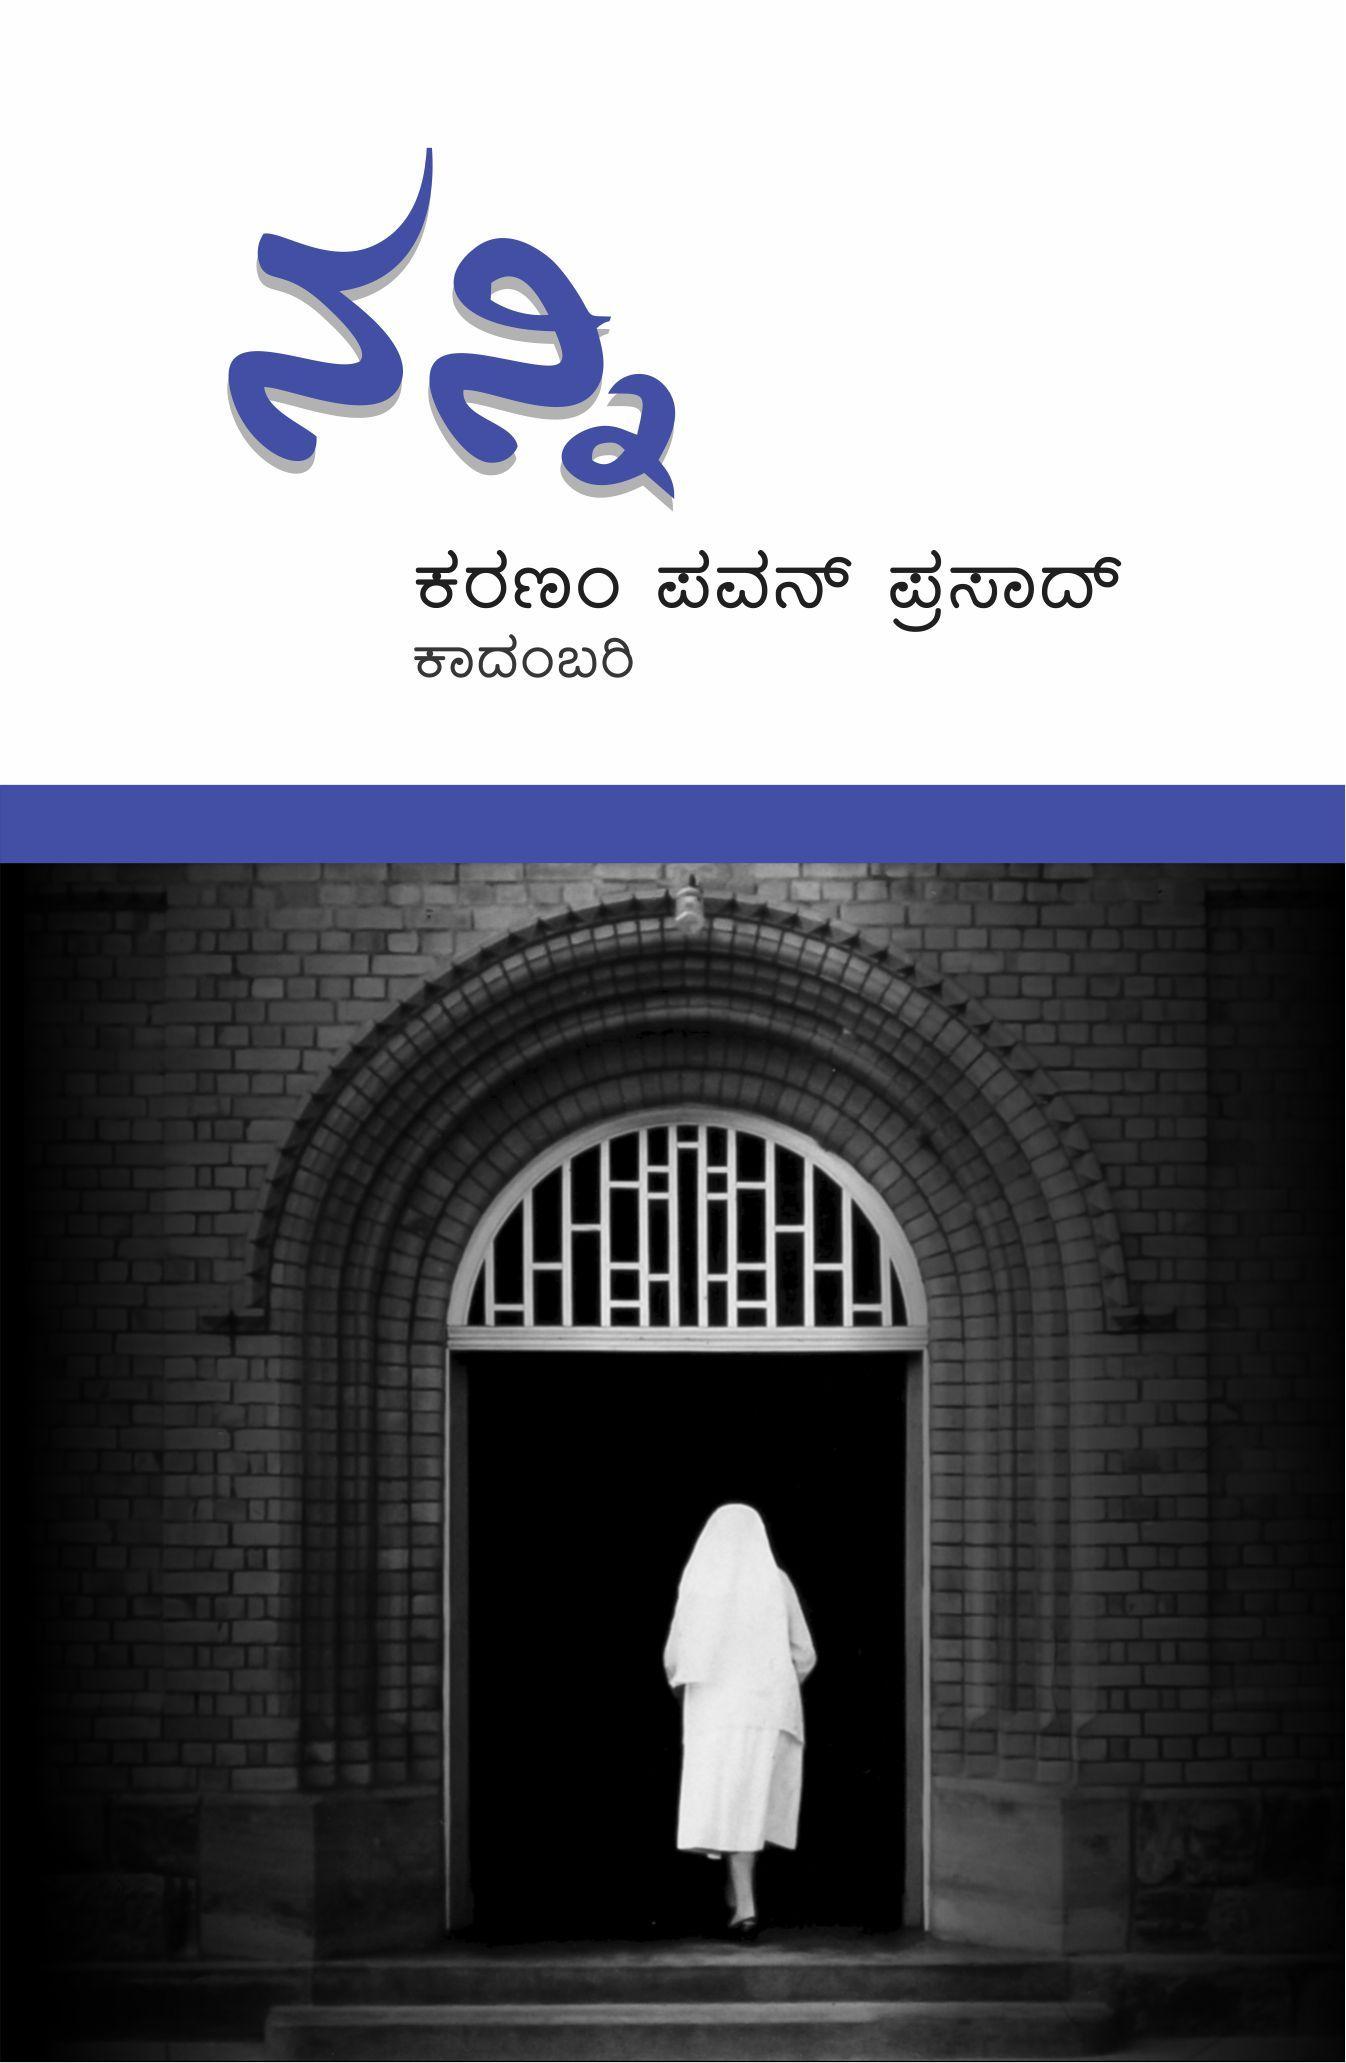 NUNNI  by  Karanam Pavan Prasad (ಕರಣಂ ಪವನ್ ಪ್ರಸಾದ್)